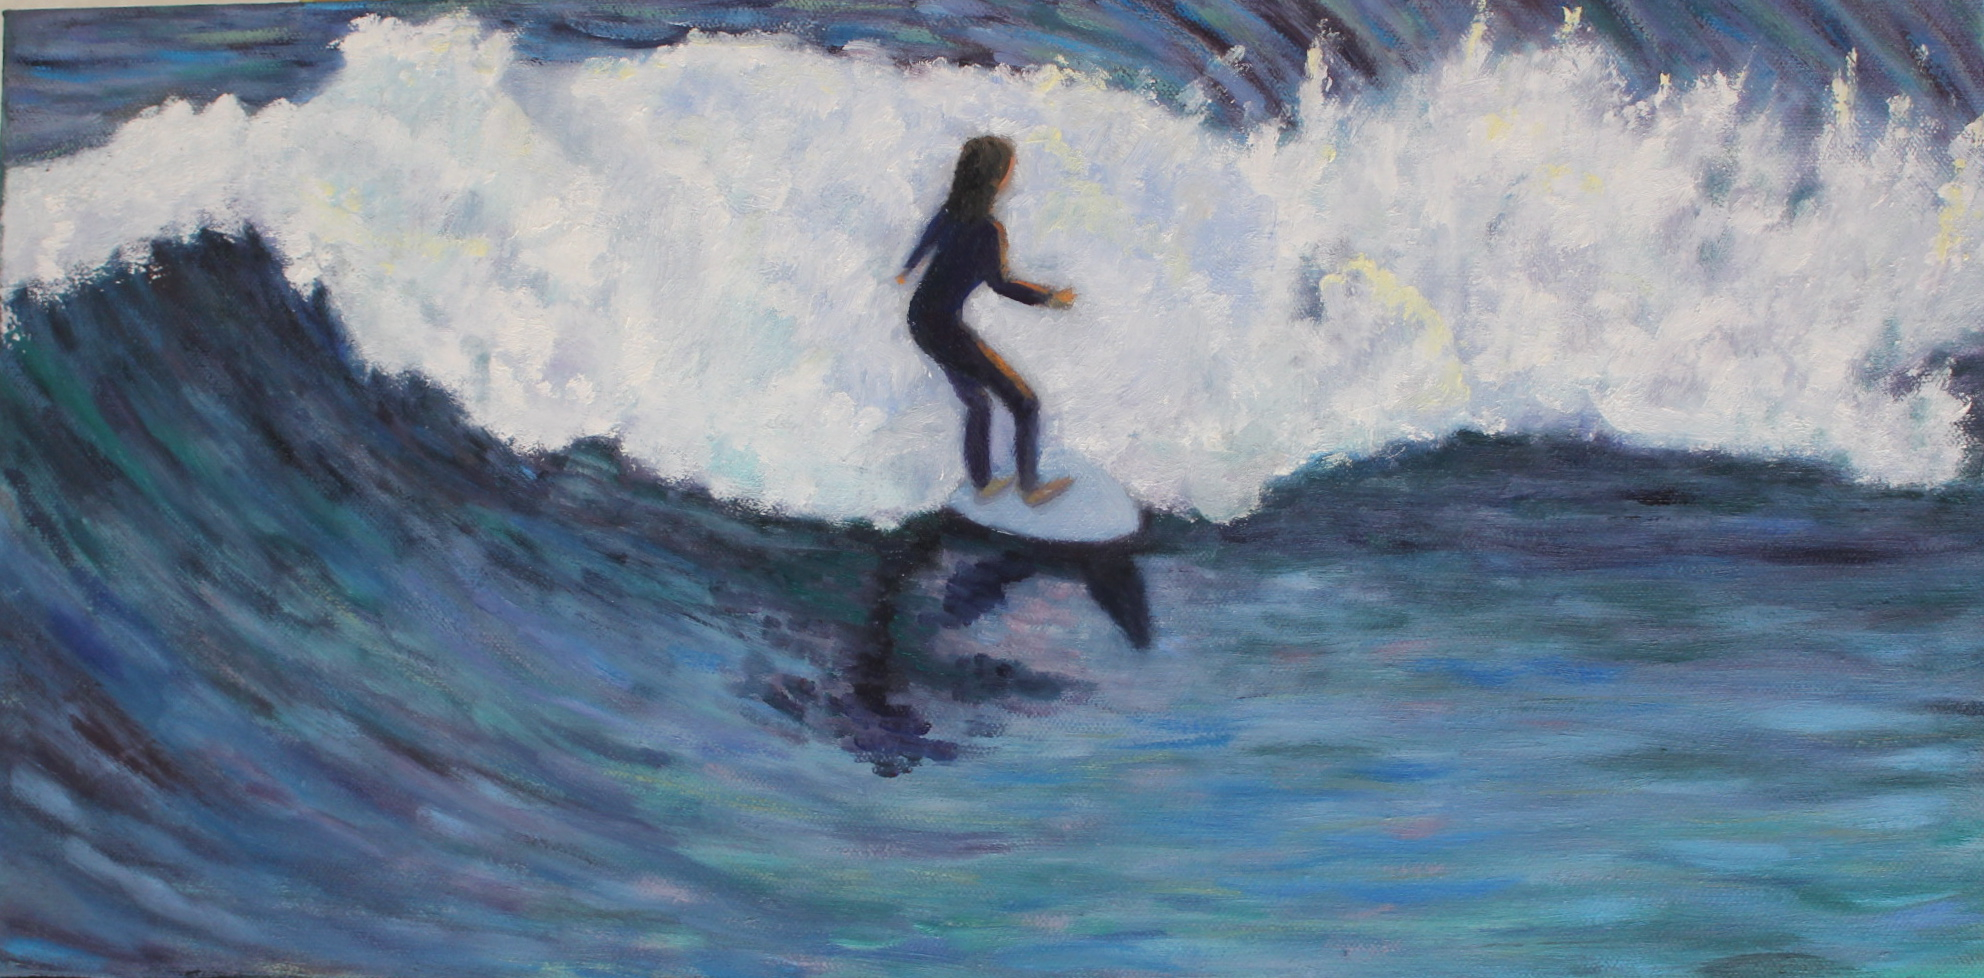 surfergirlCarlsbad